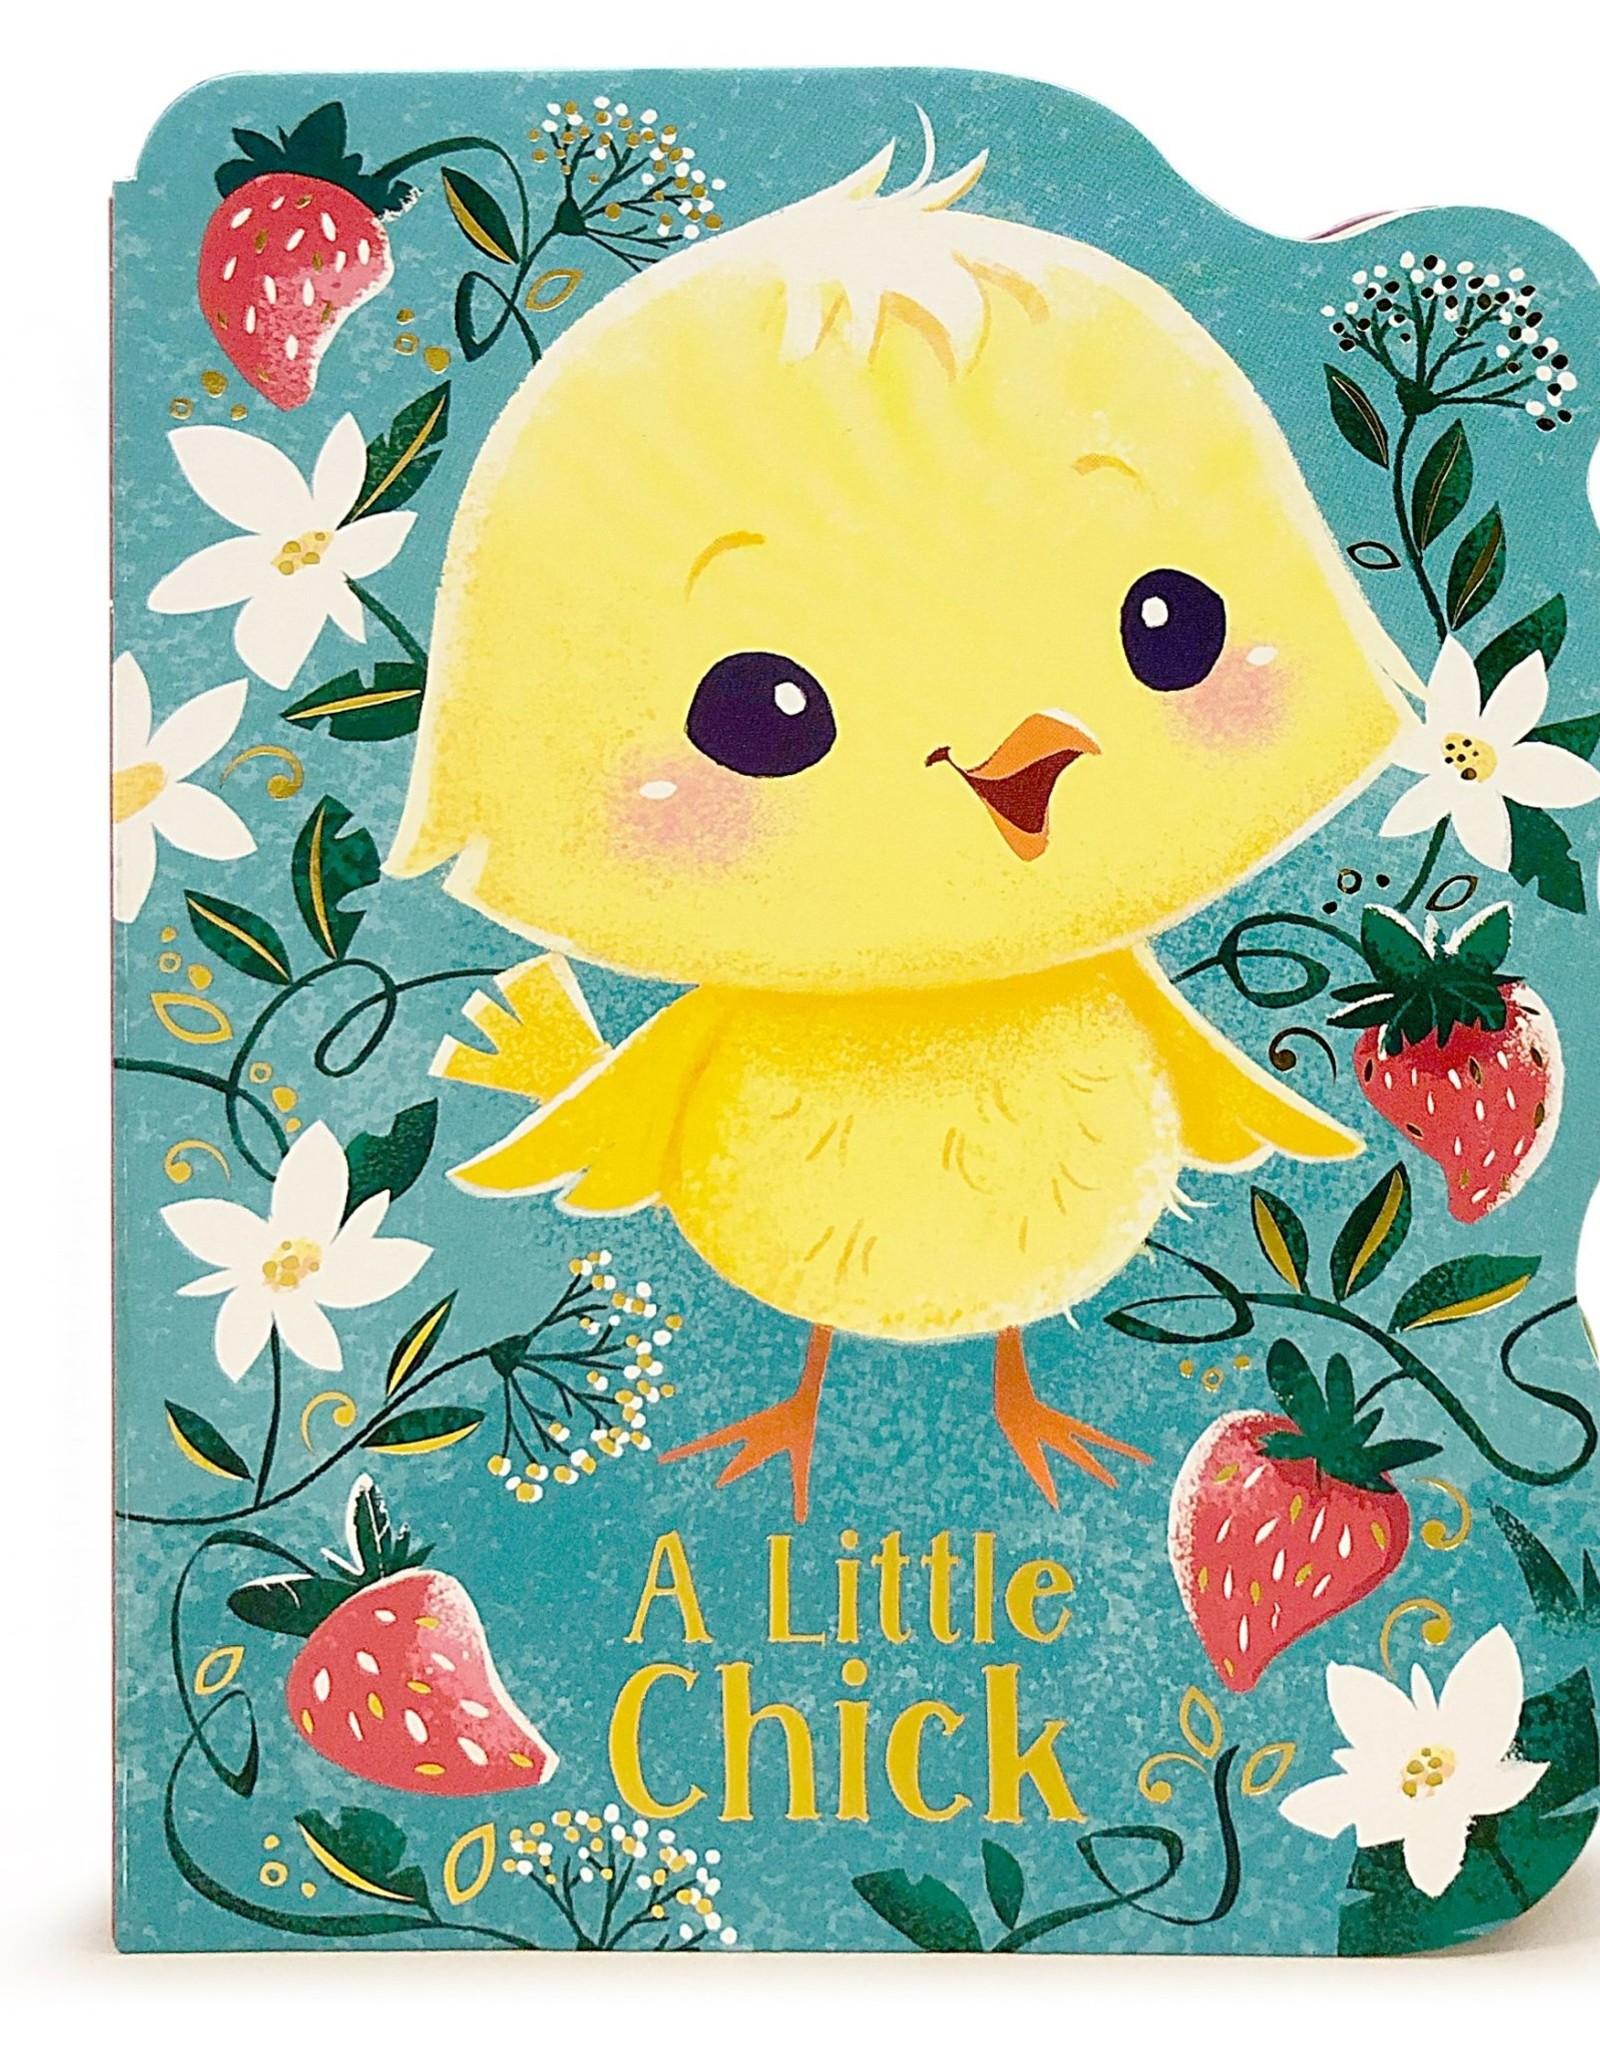 Cottage Door Press A Little Chick